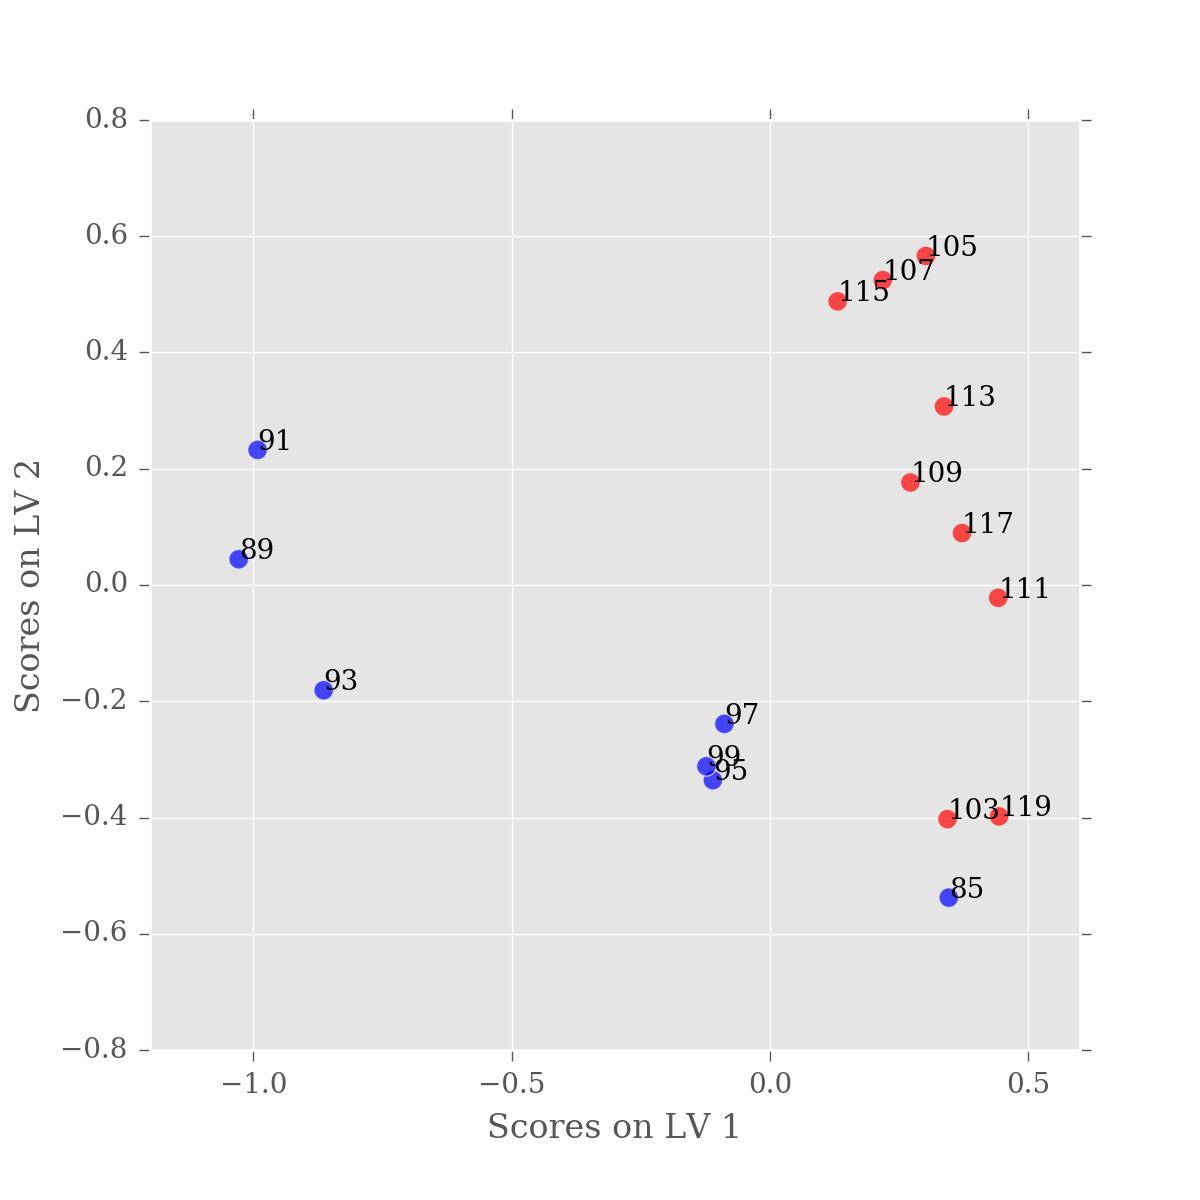 PLS-DA Scores plot for filtered data, LV1 and LV2 with sample labels